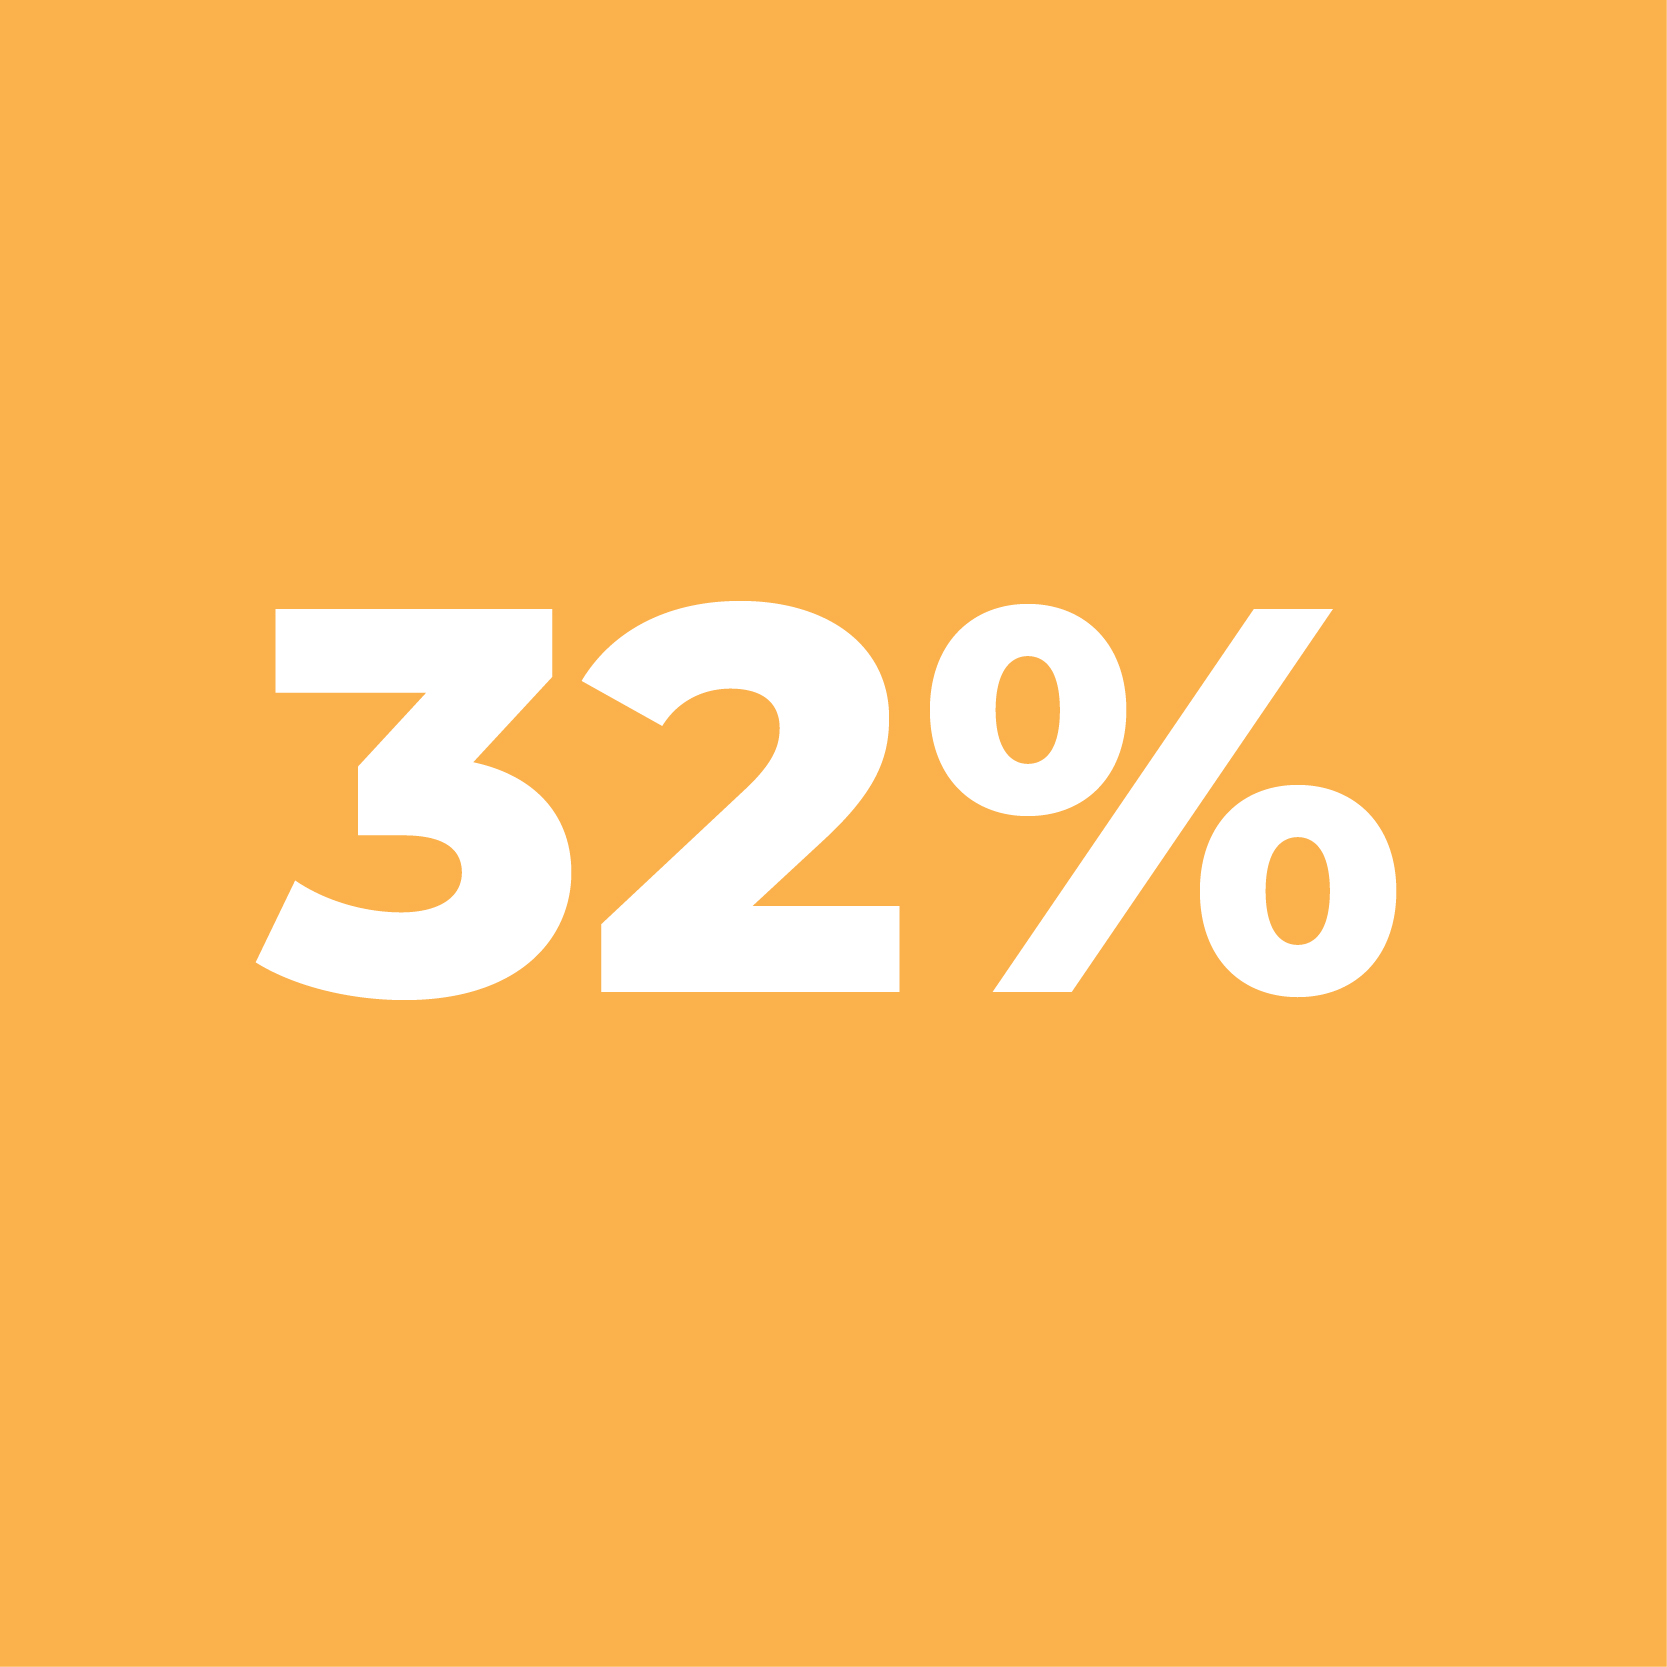 percentagem-01